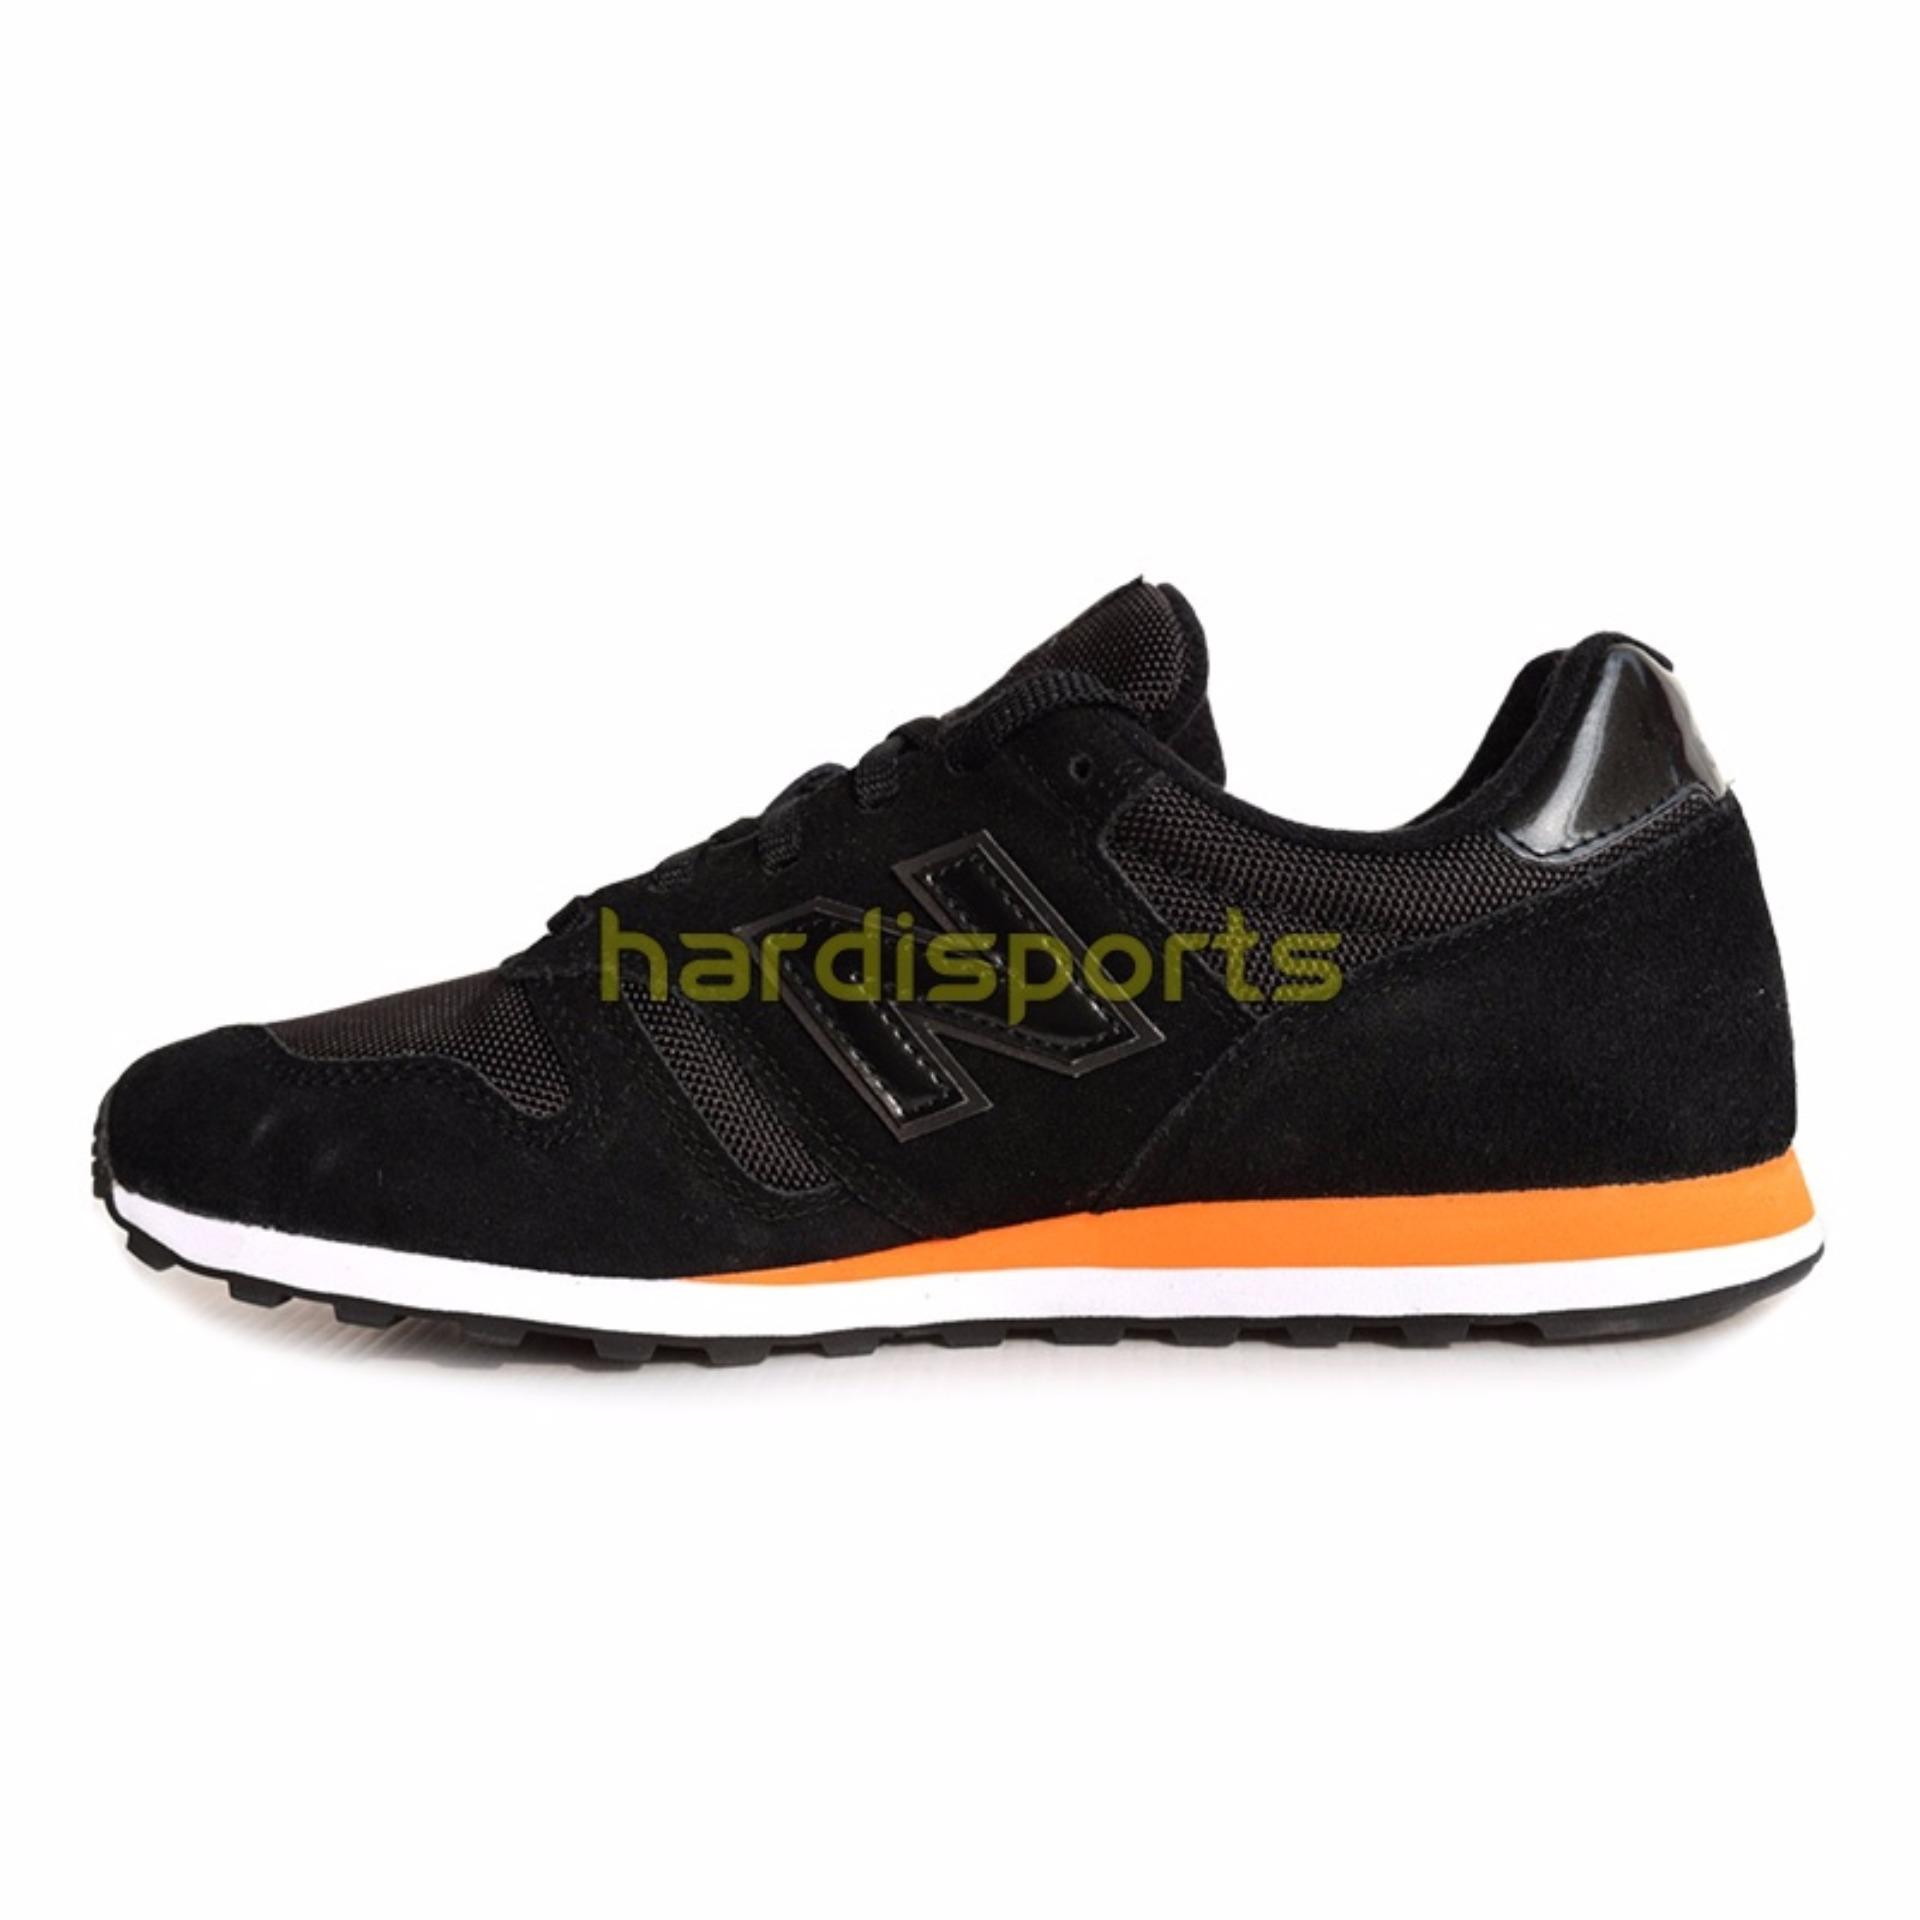 Sepatu Sneaker Kzoot Marques Black White - Daftar Harga   Barang ... 0e0095d20b